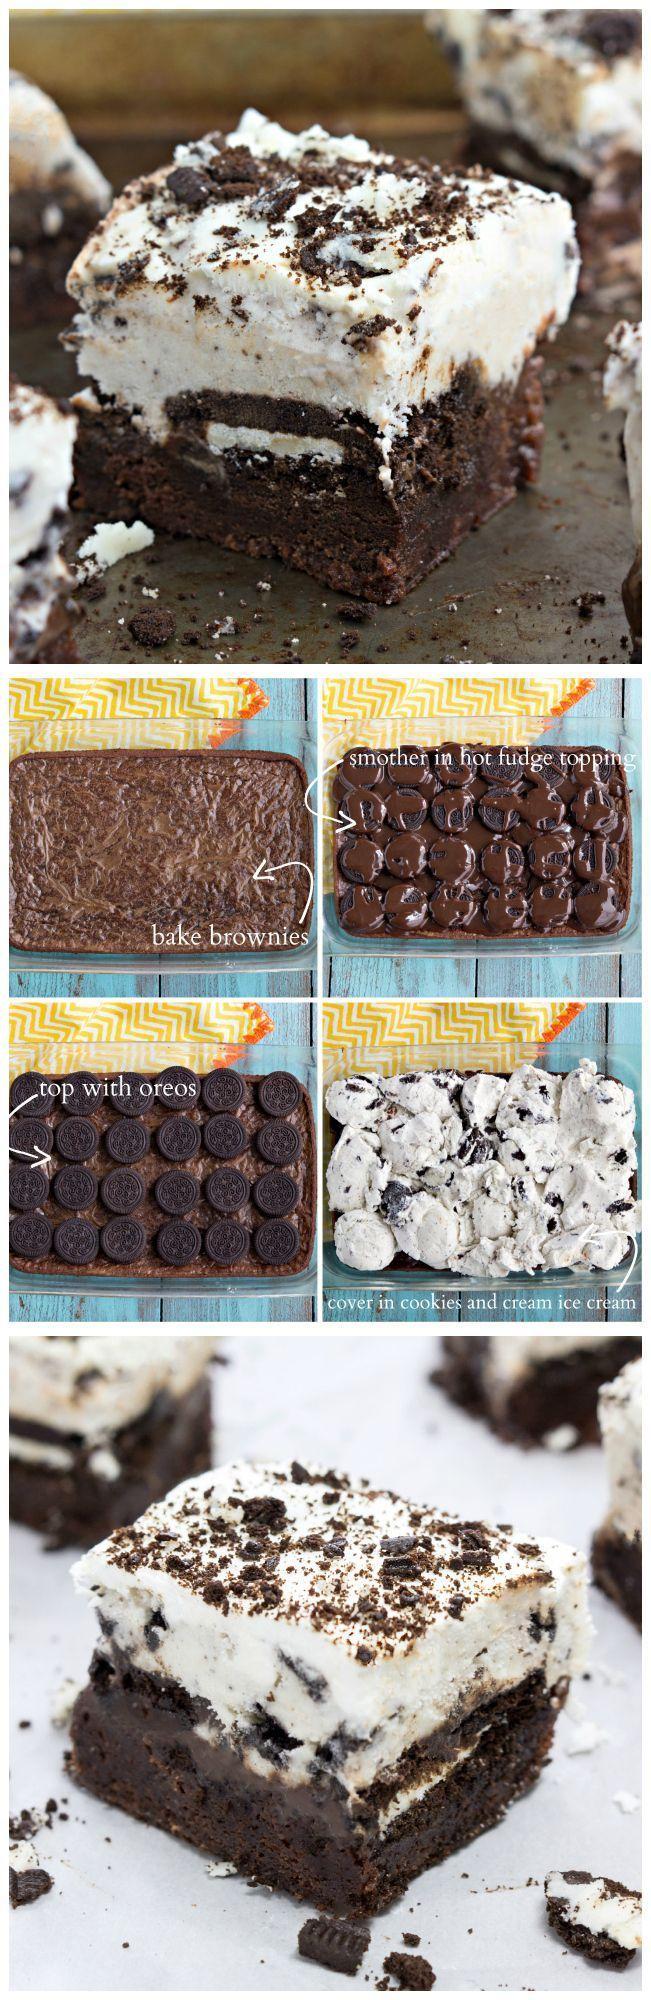 Brownie Oreo Ice Cream Bars Recipe chocolate diy recipe oreos recipes easy recipes diy ideas party ideas desert recipe food tutorials